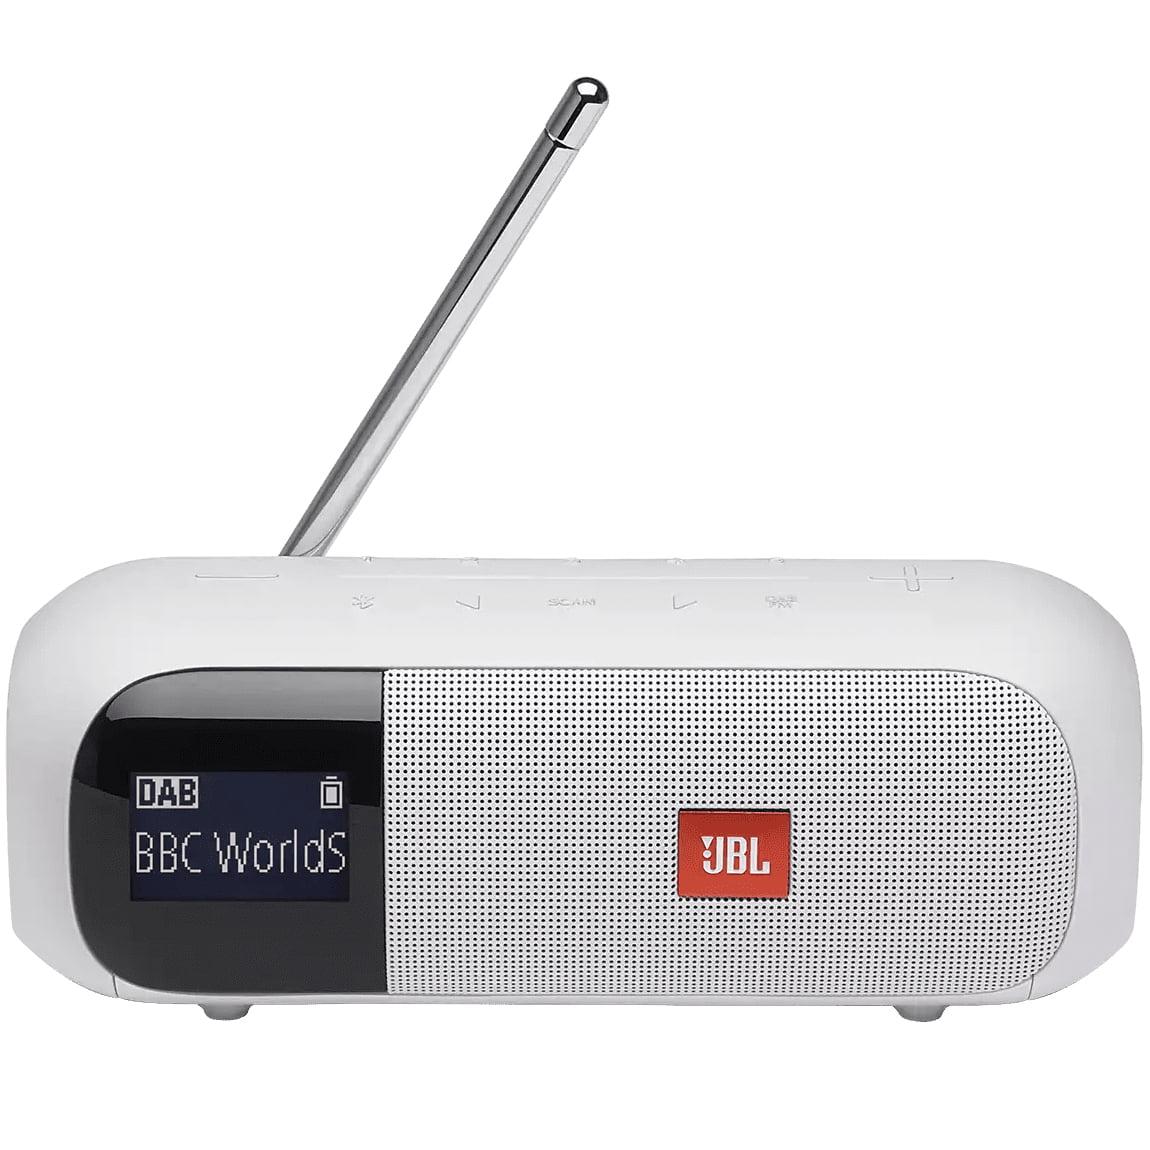 Boxa portabila JBL Tuner 2, Wireless, Bluetooth, DAB/FM, IPX7 Waterproof, White